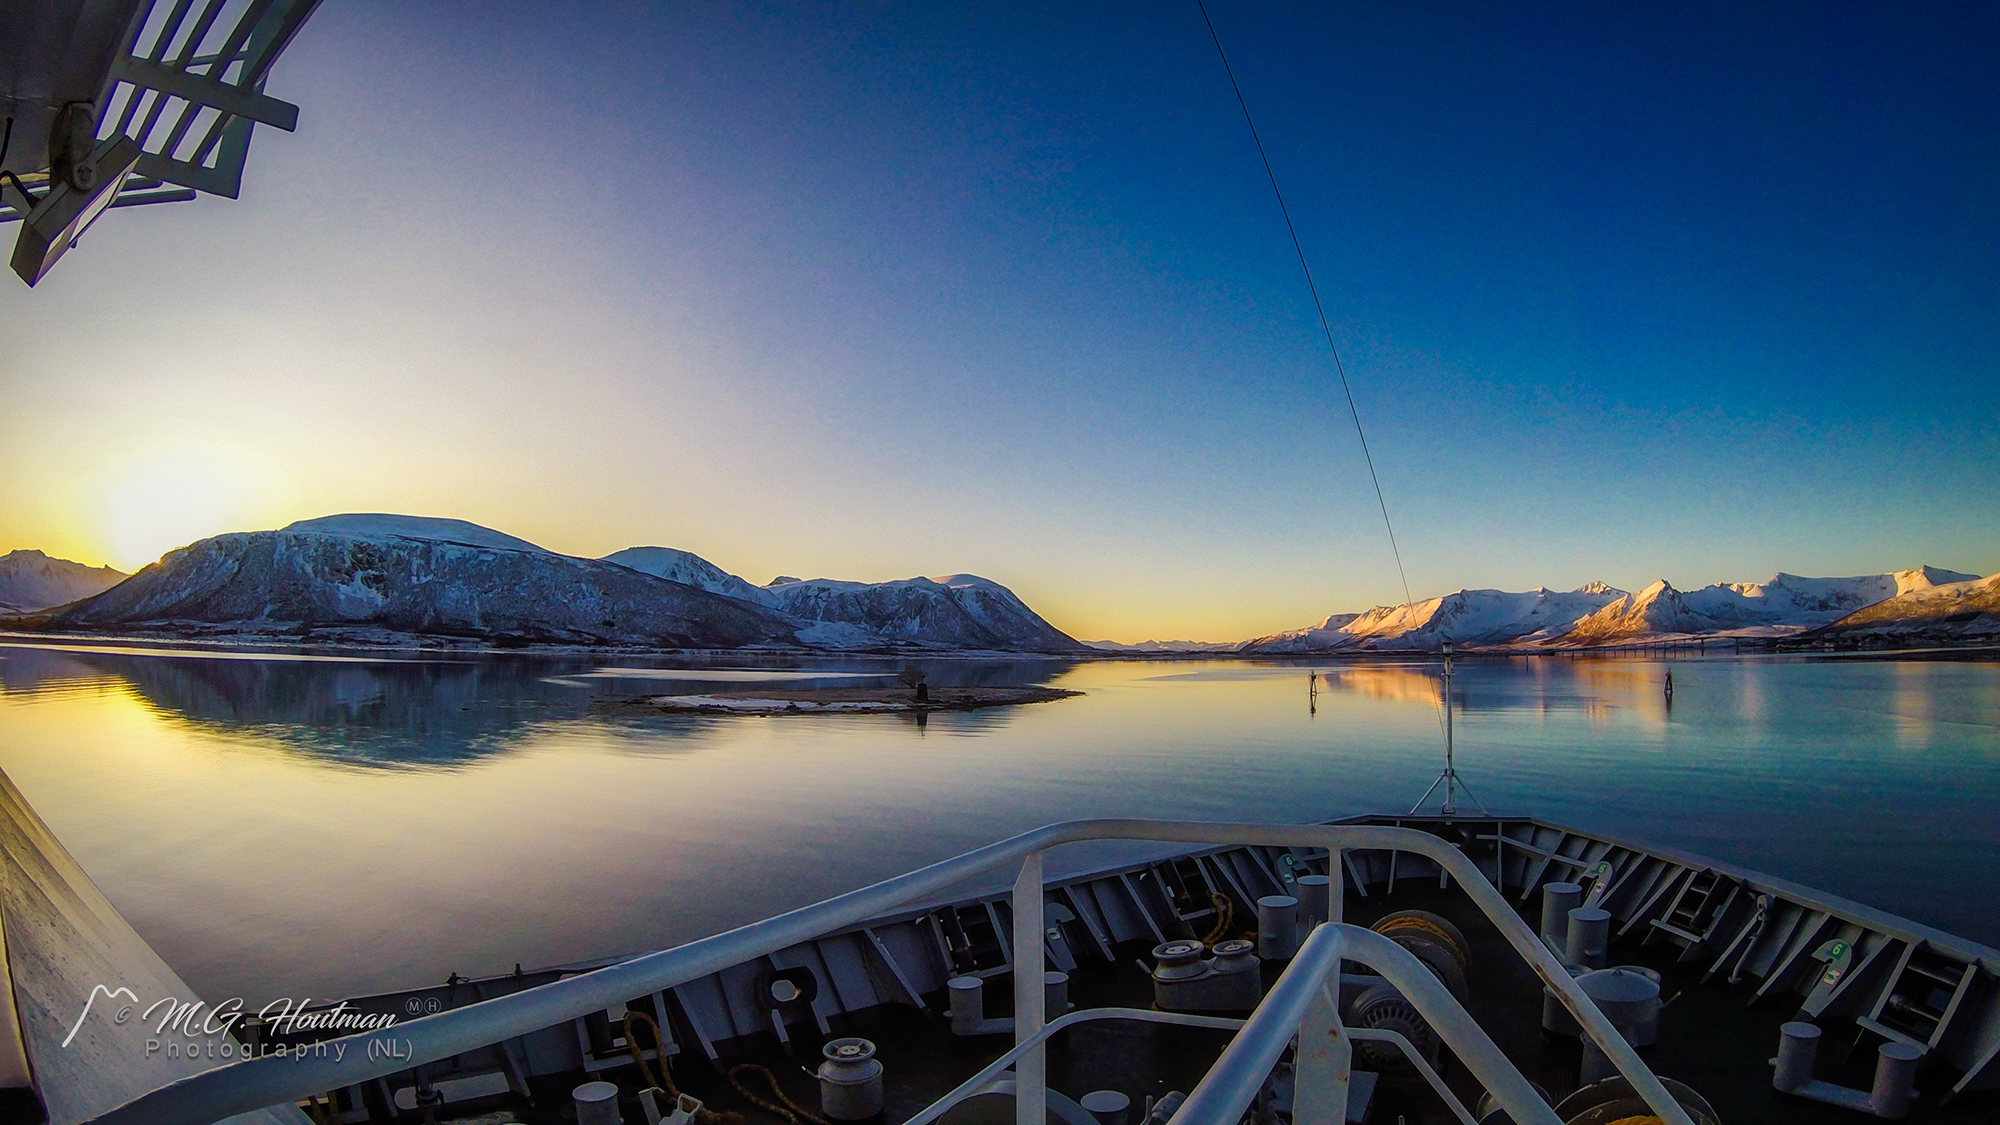 Risøyhamn, Nordland - Norway